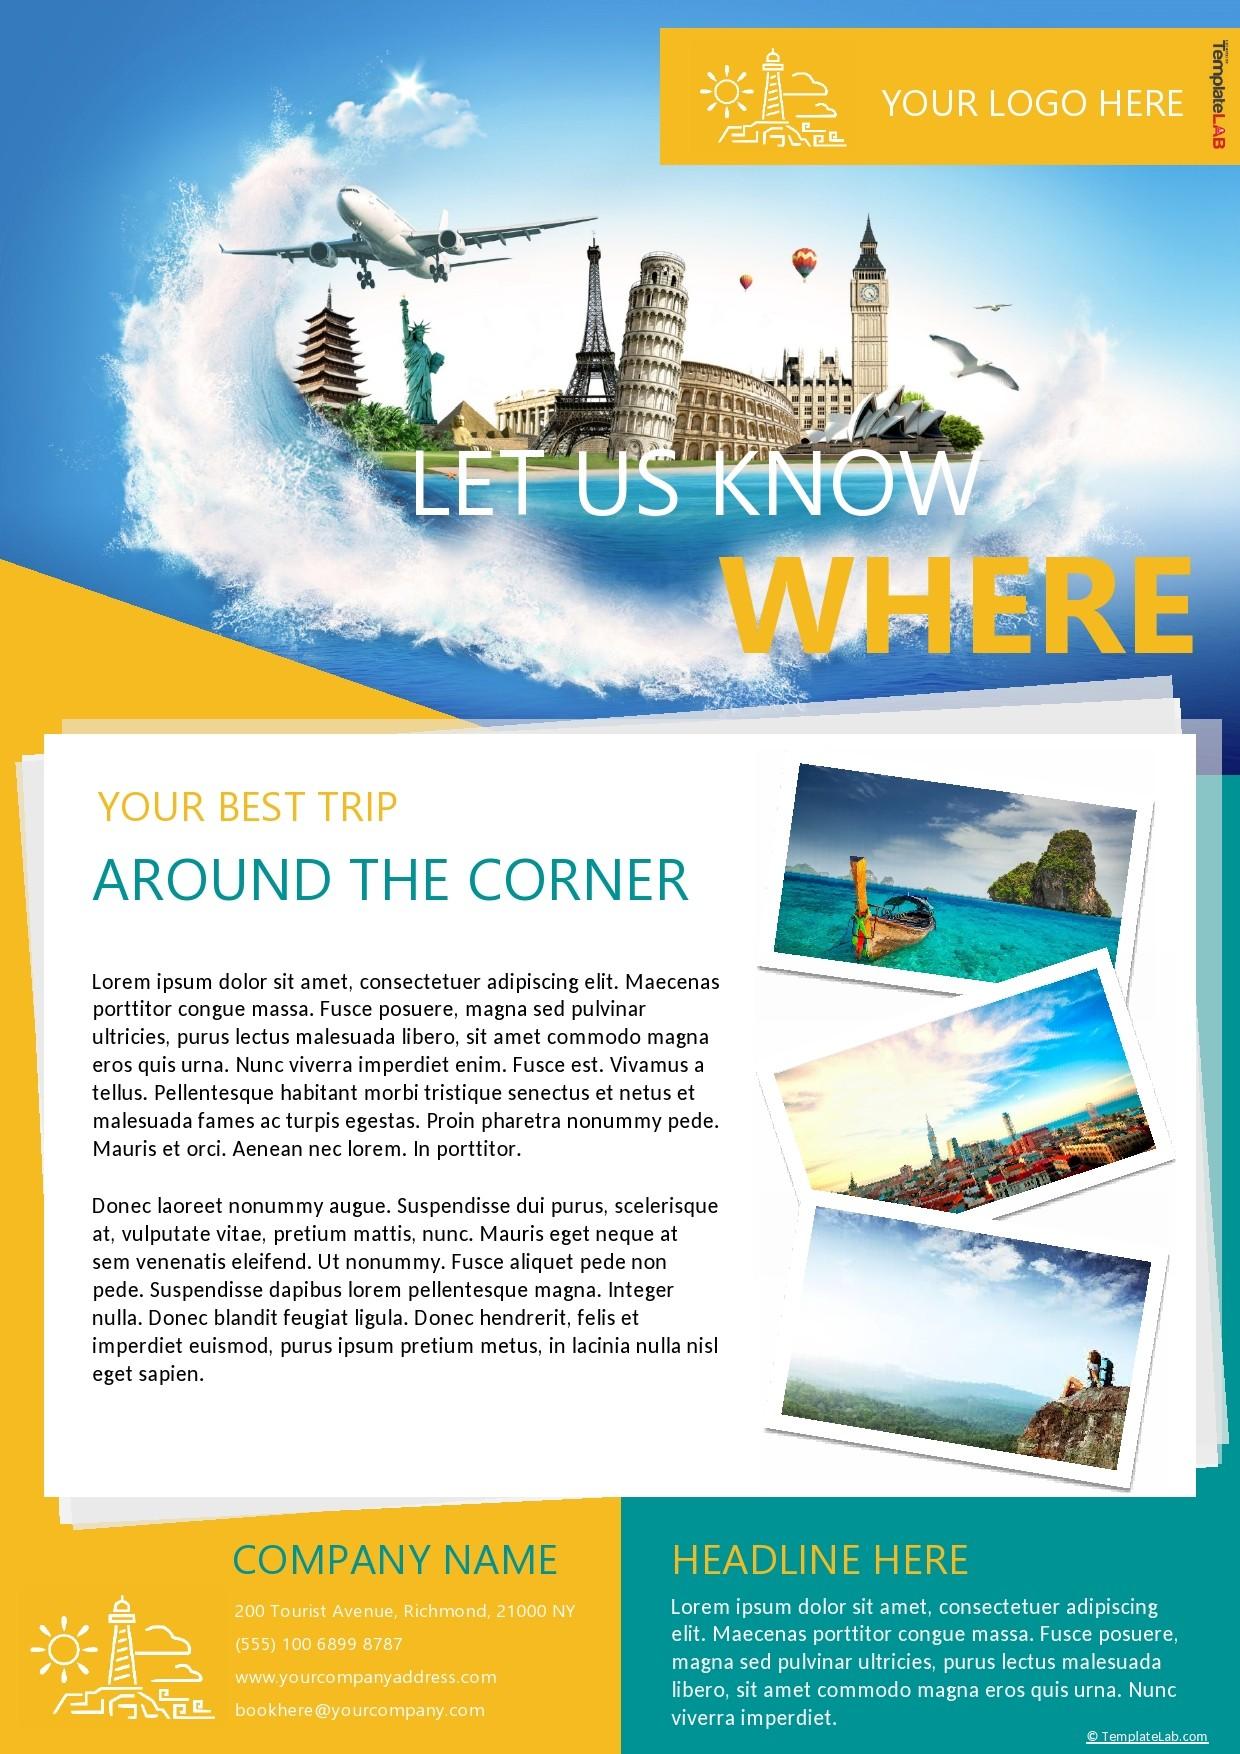 Free Travel Agency Company Profile Template - TemplateLab.com